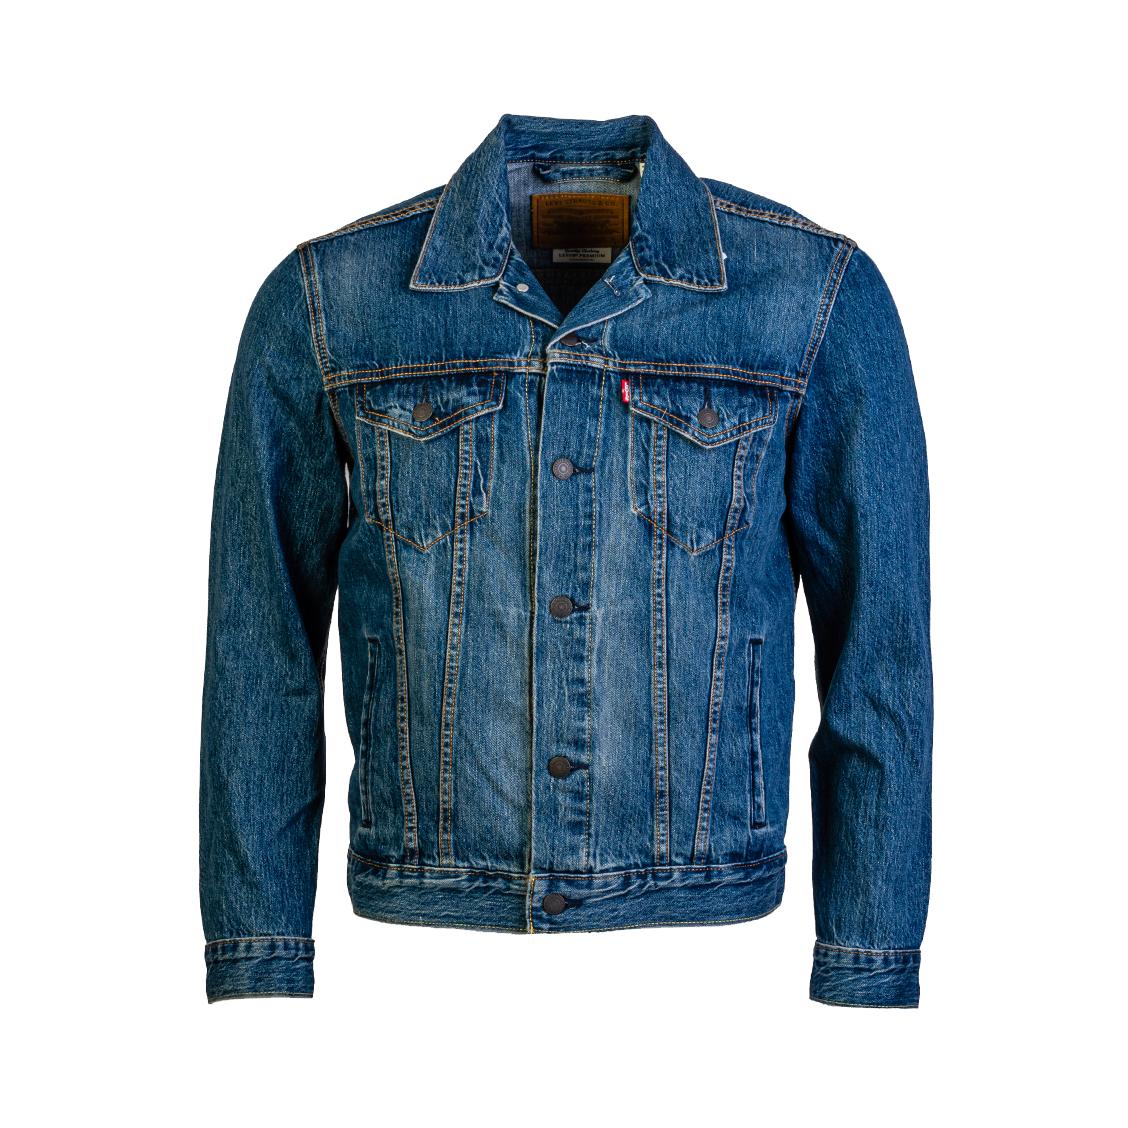 Blouson levi\'s trucker mayze en jean bleu denim